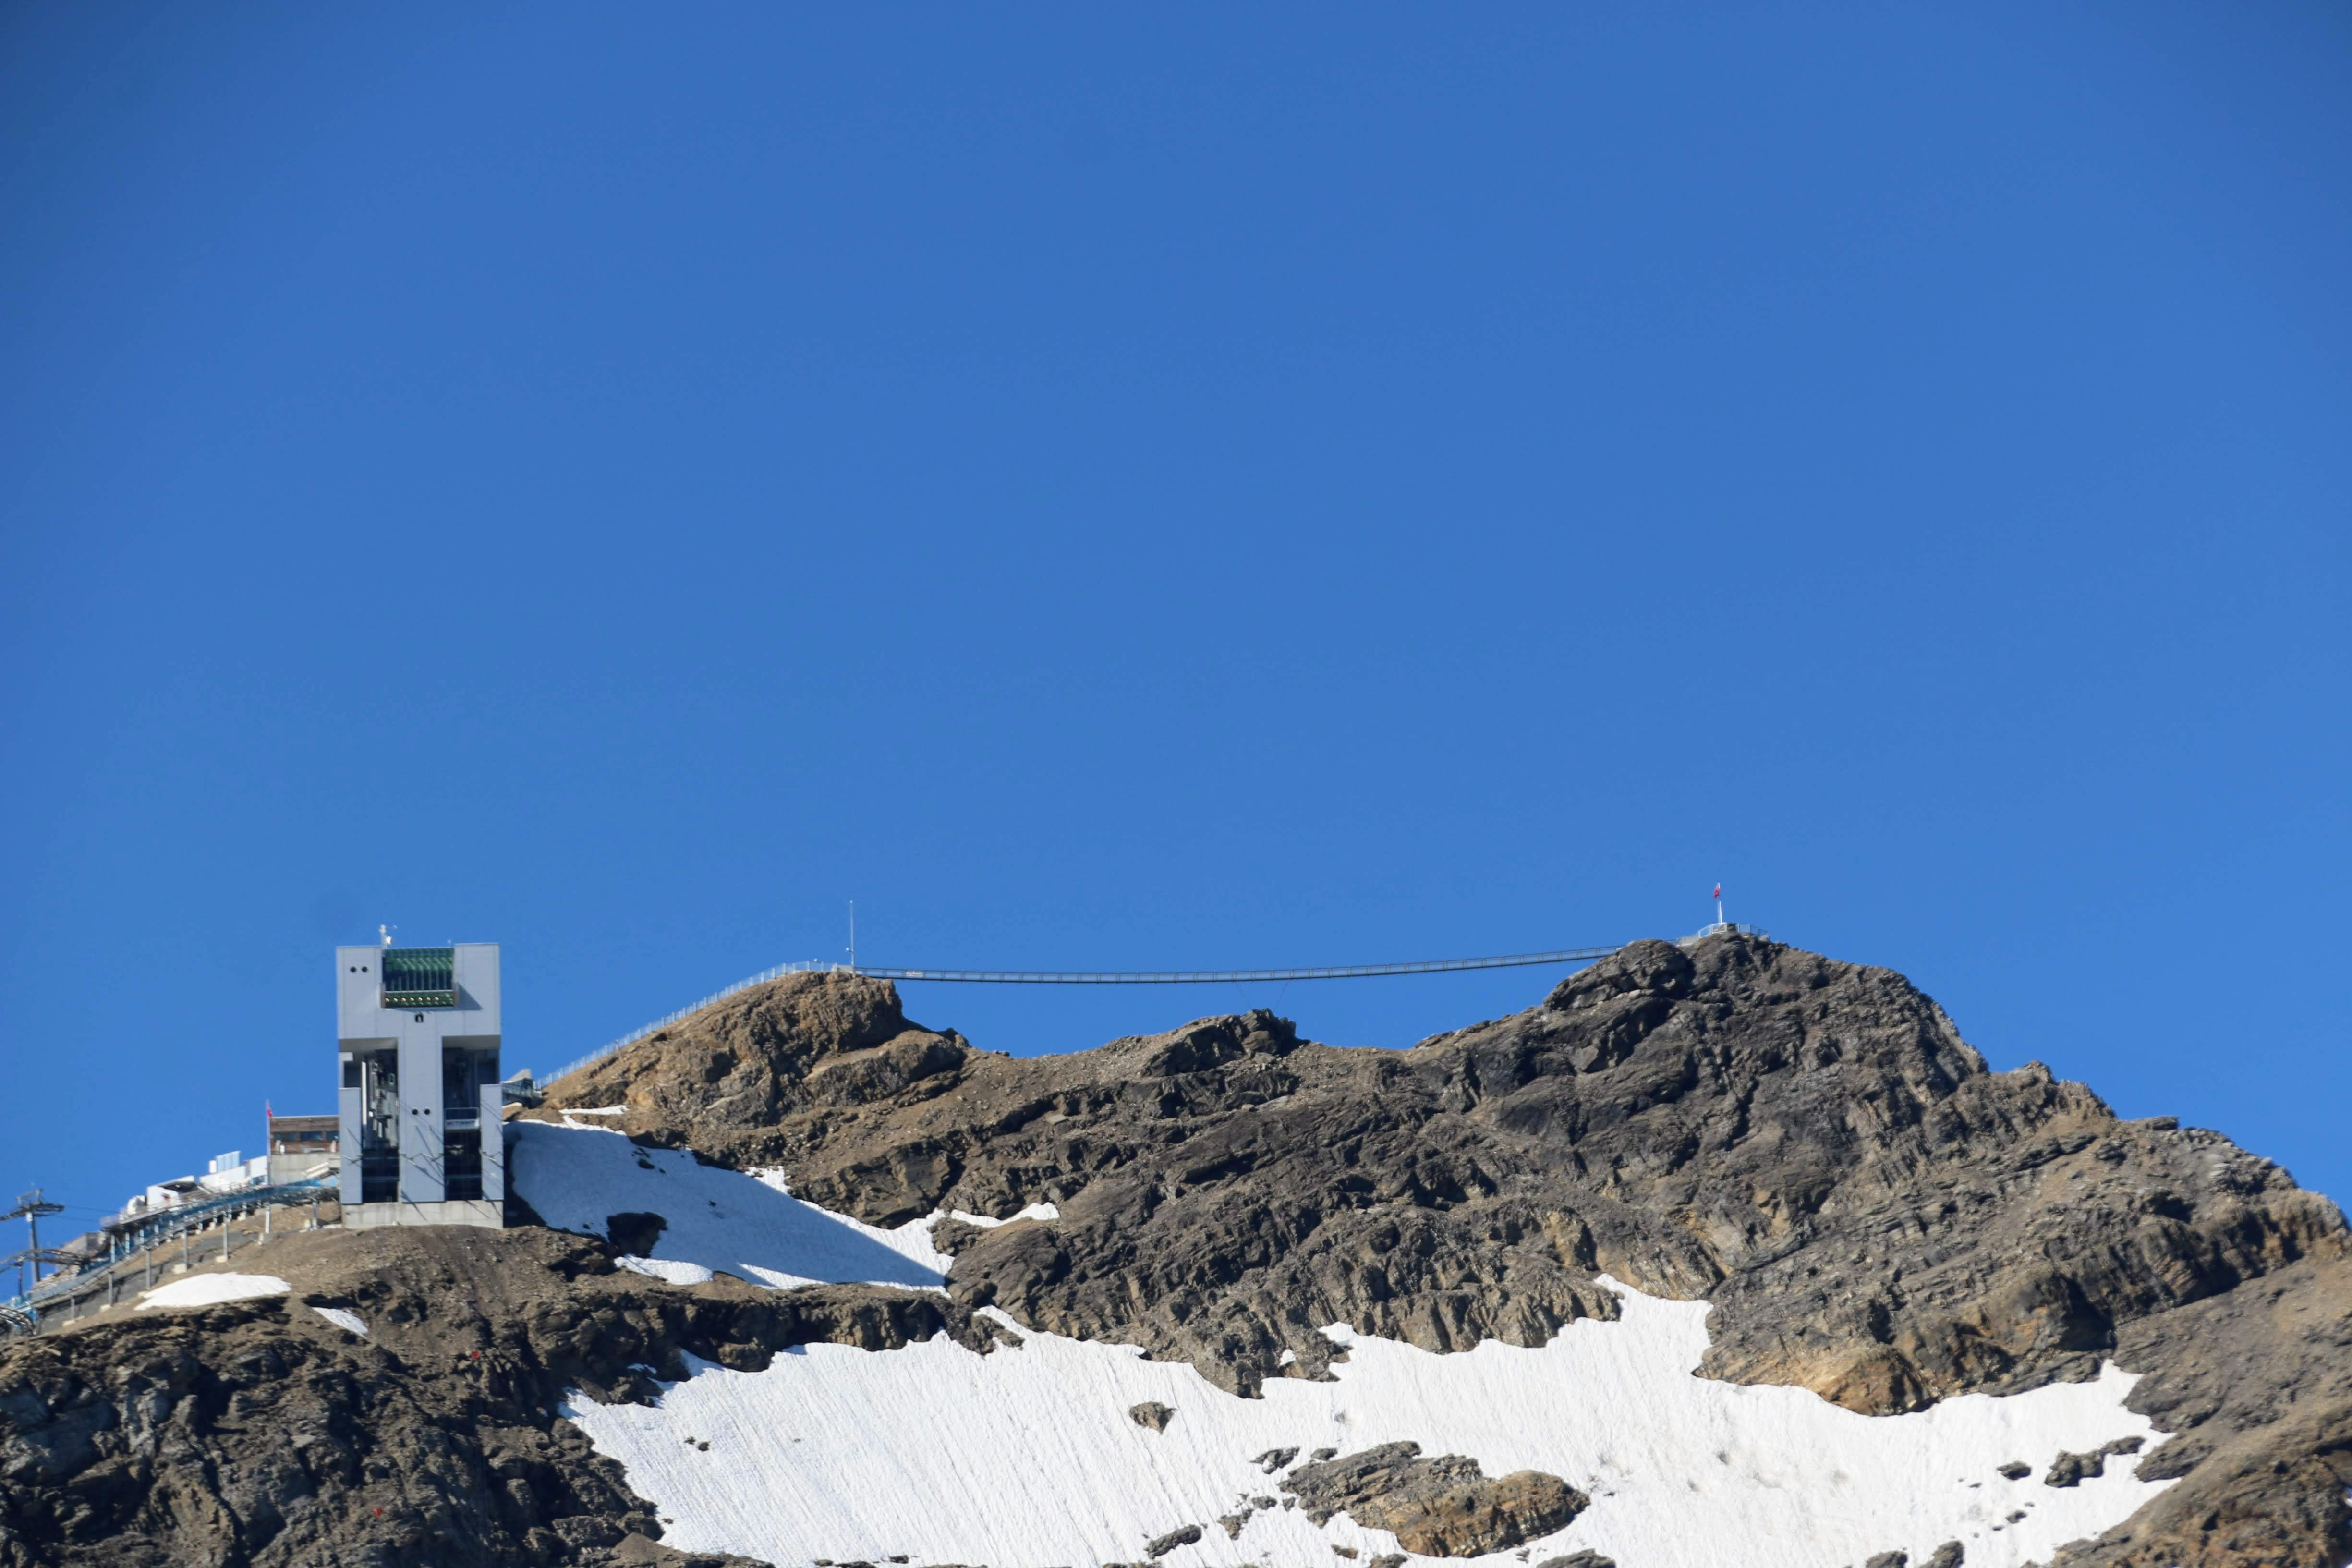 Hangbrug die twee bergtoppen verbindt